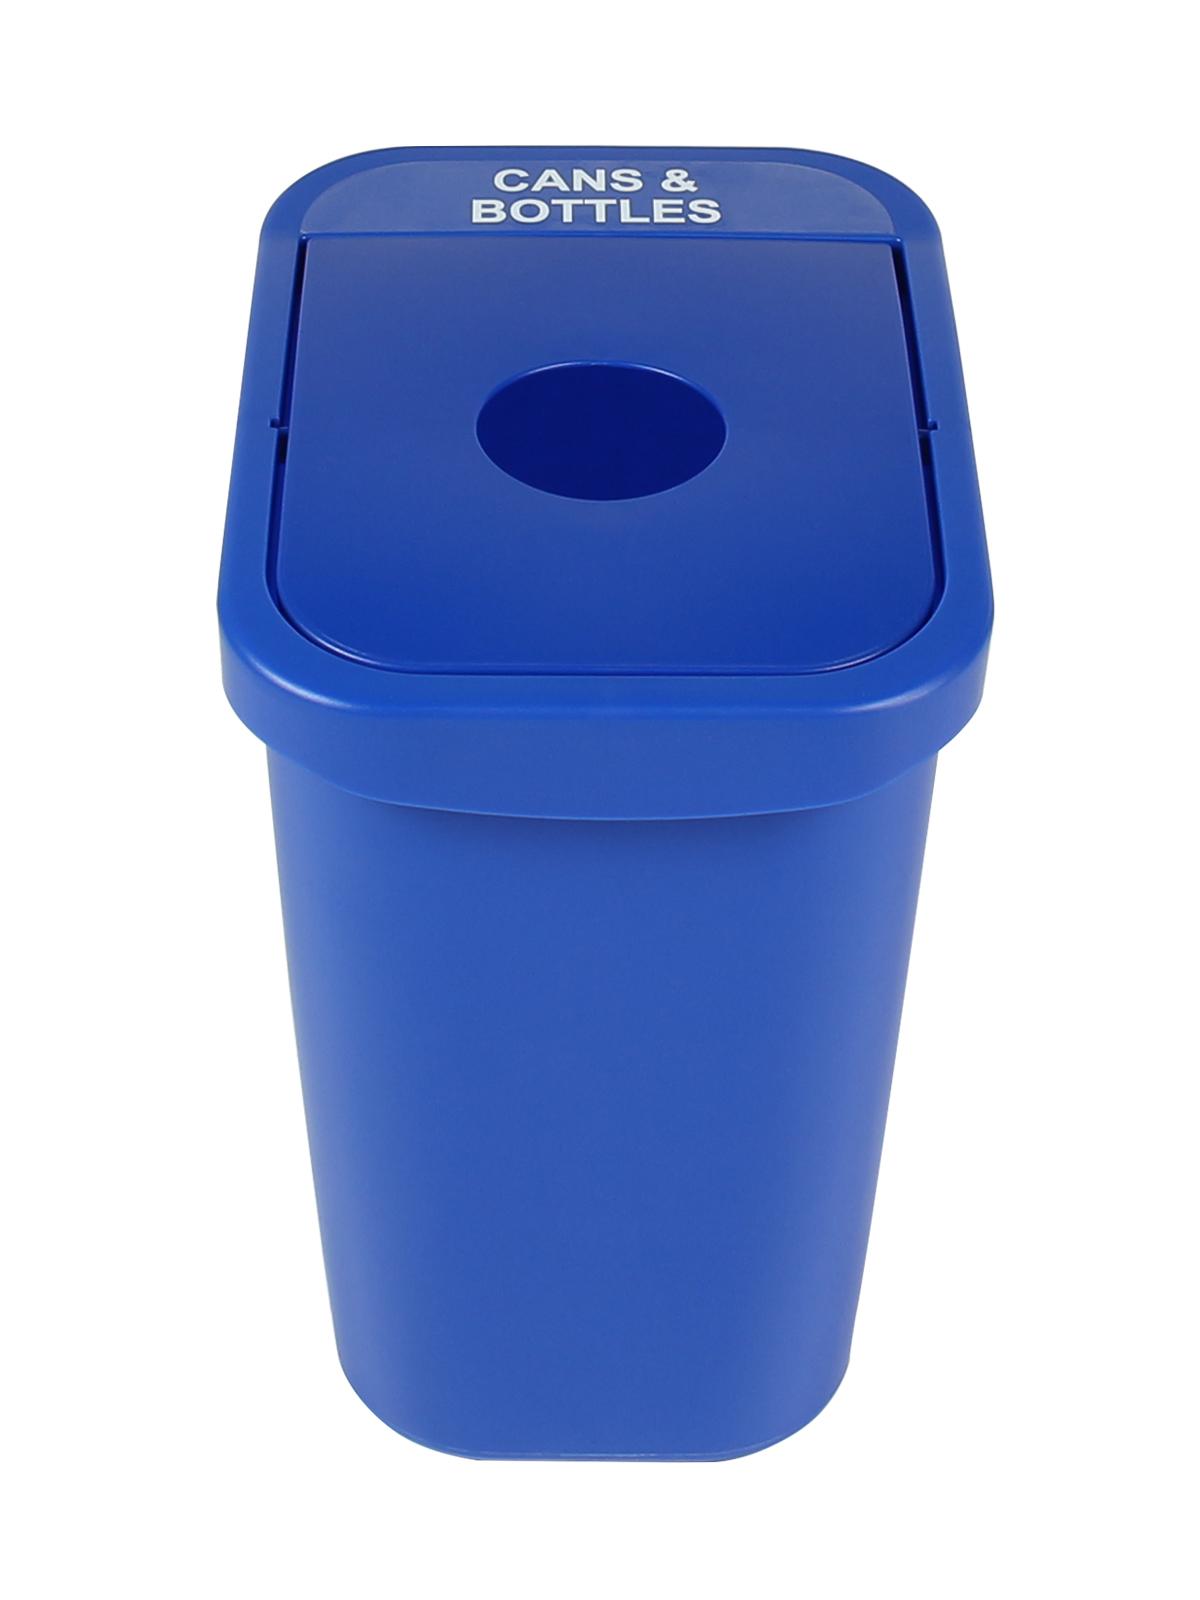 BILLI BOX - Single - 7 G - Cans & Bottles - Circle - Blue